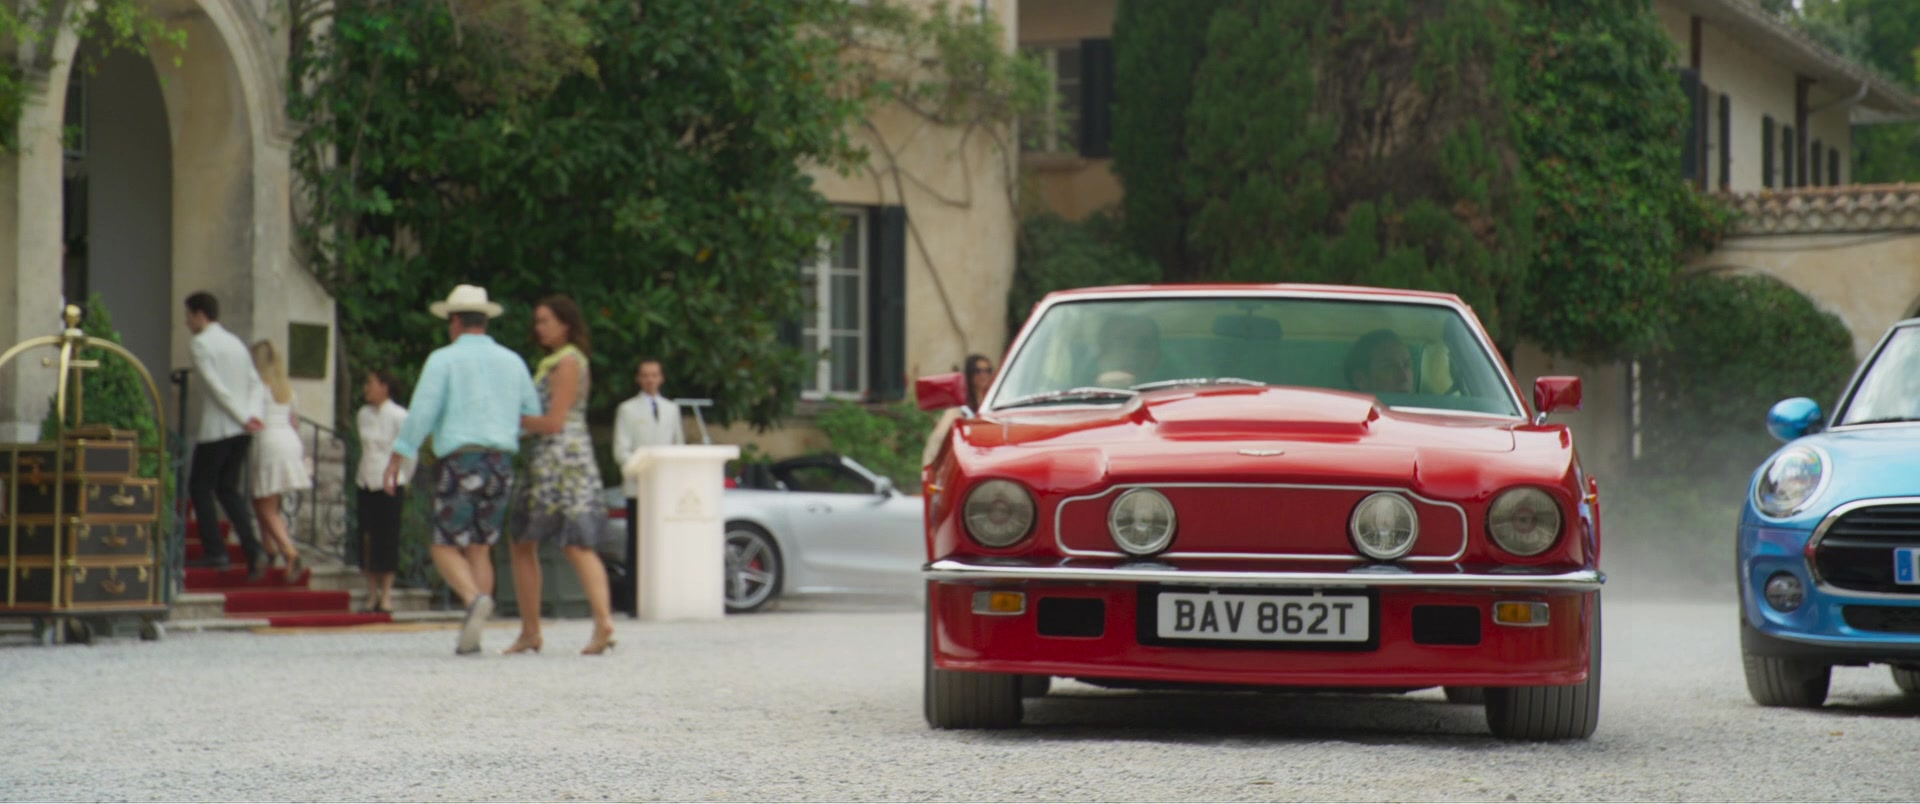 1979 Aston Martin V8 Vantage MkI Sports Car in Johnny English Strikes Again (2018) Movie